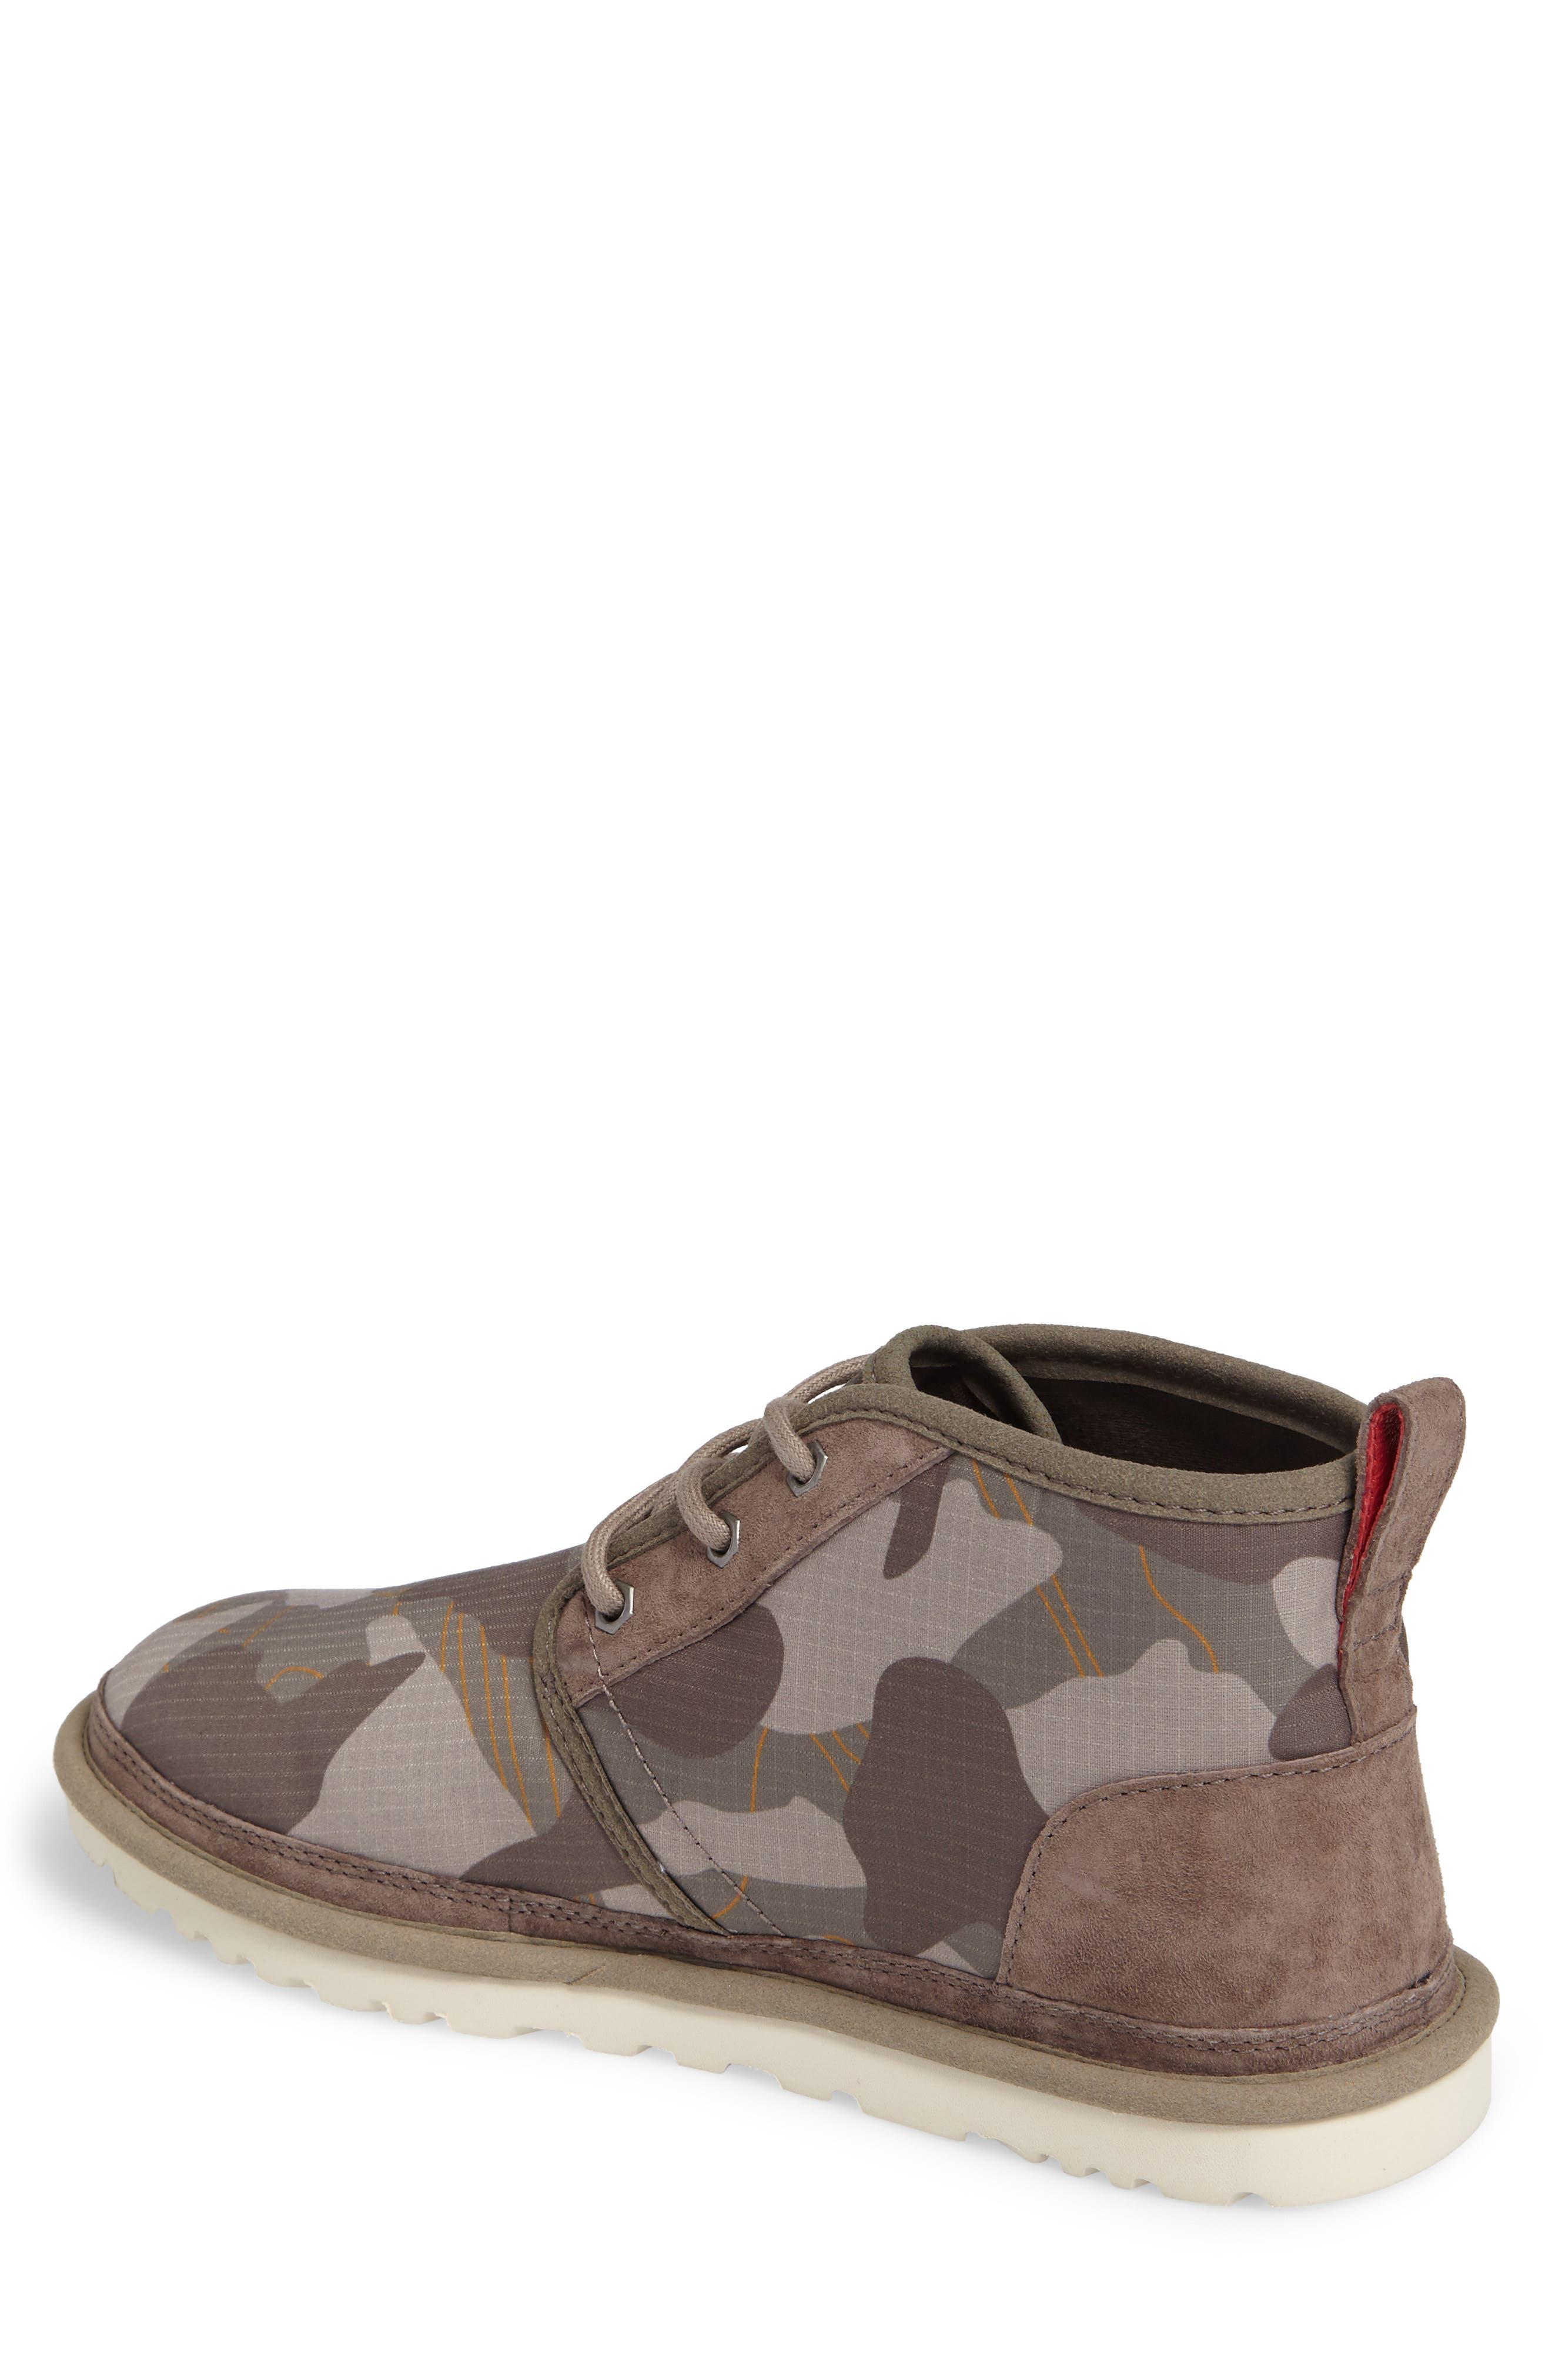 Alternate Image 2  - UGG® Neumel Camo Chukka Boot (Men)